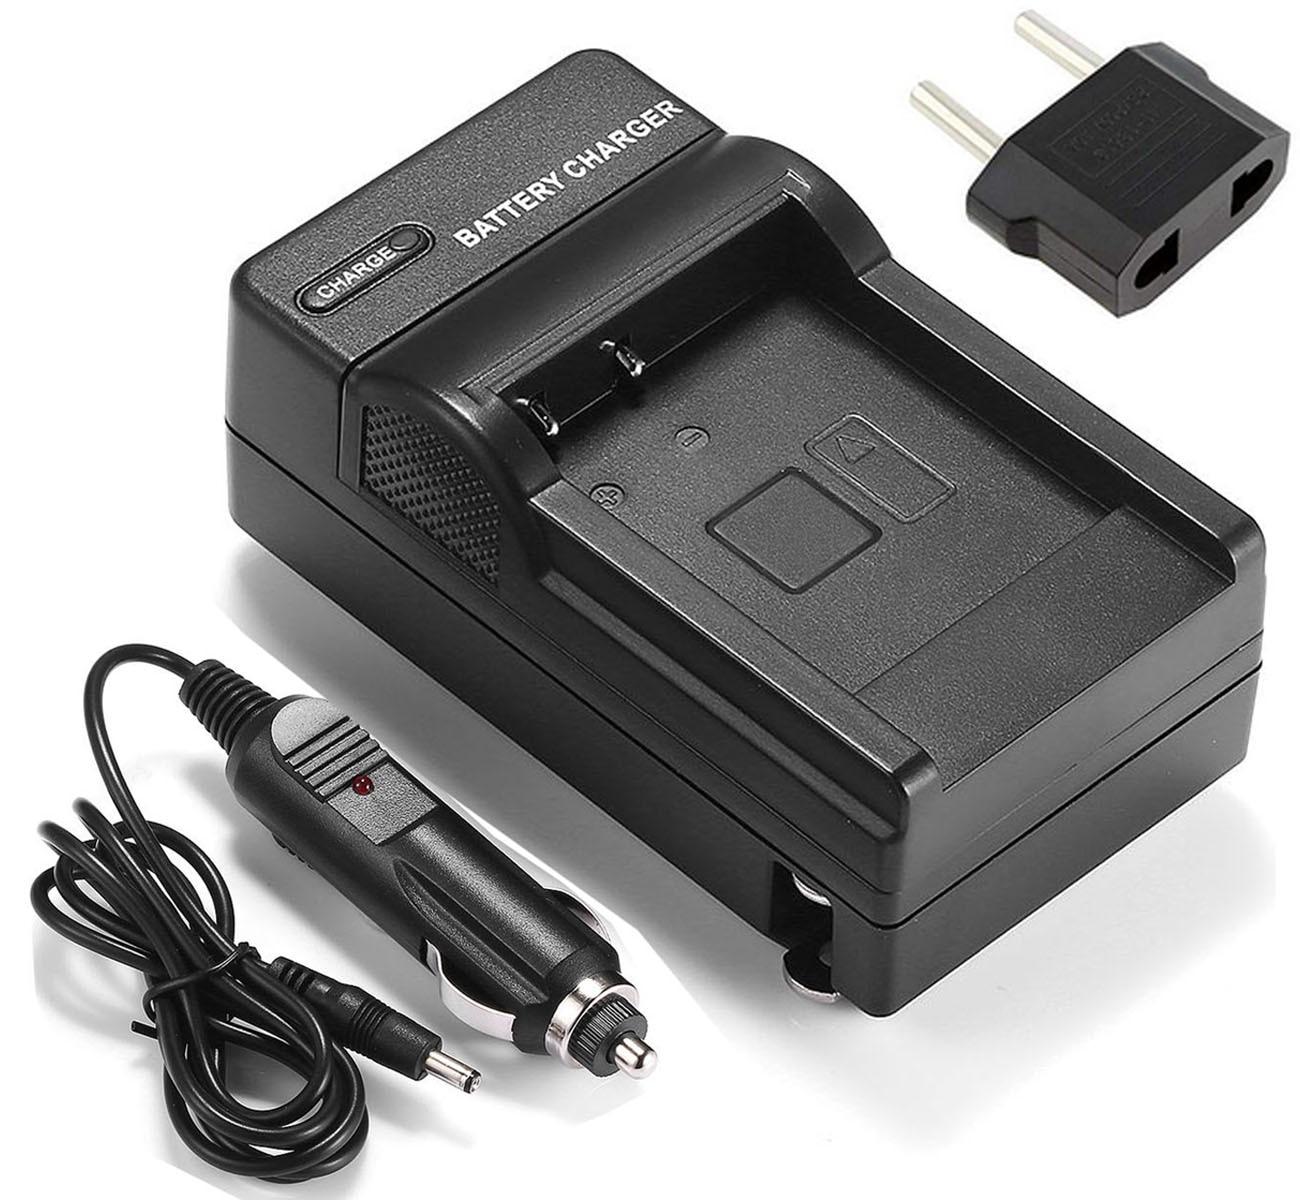 Micro USB CHARGER for PANASONIC LUMIX DMC-TZ7 DMCTZ7